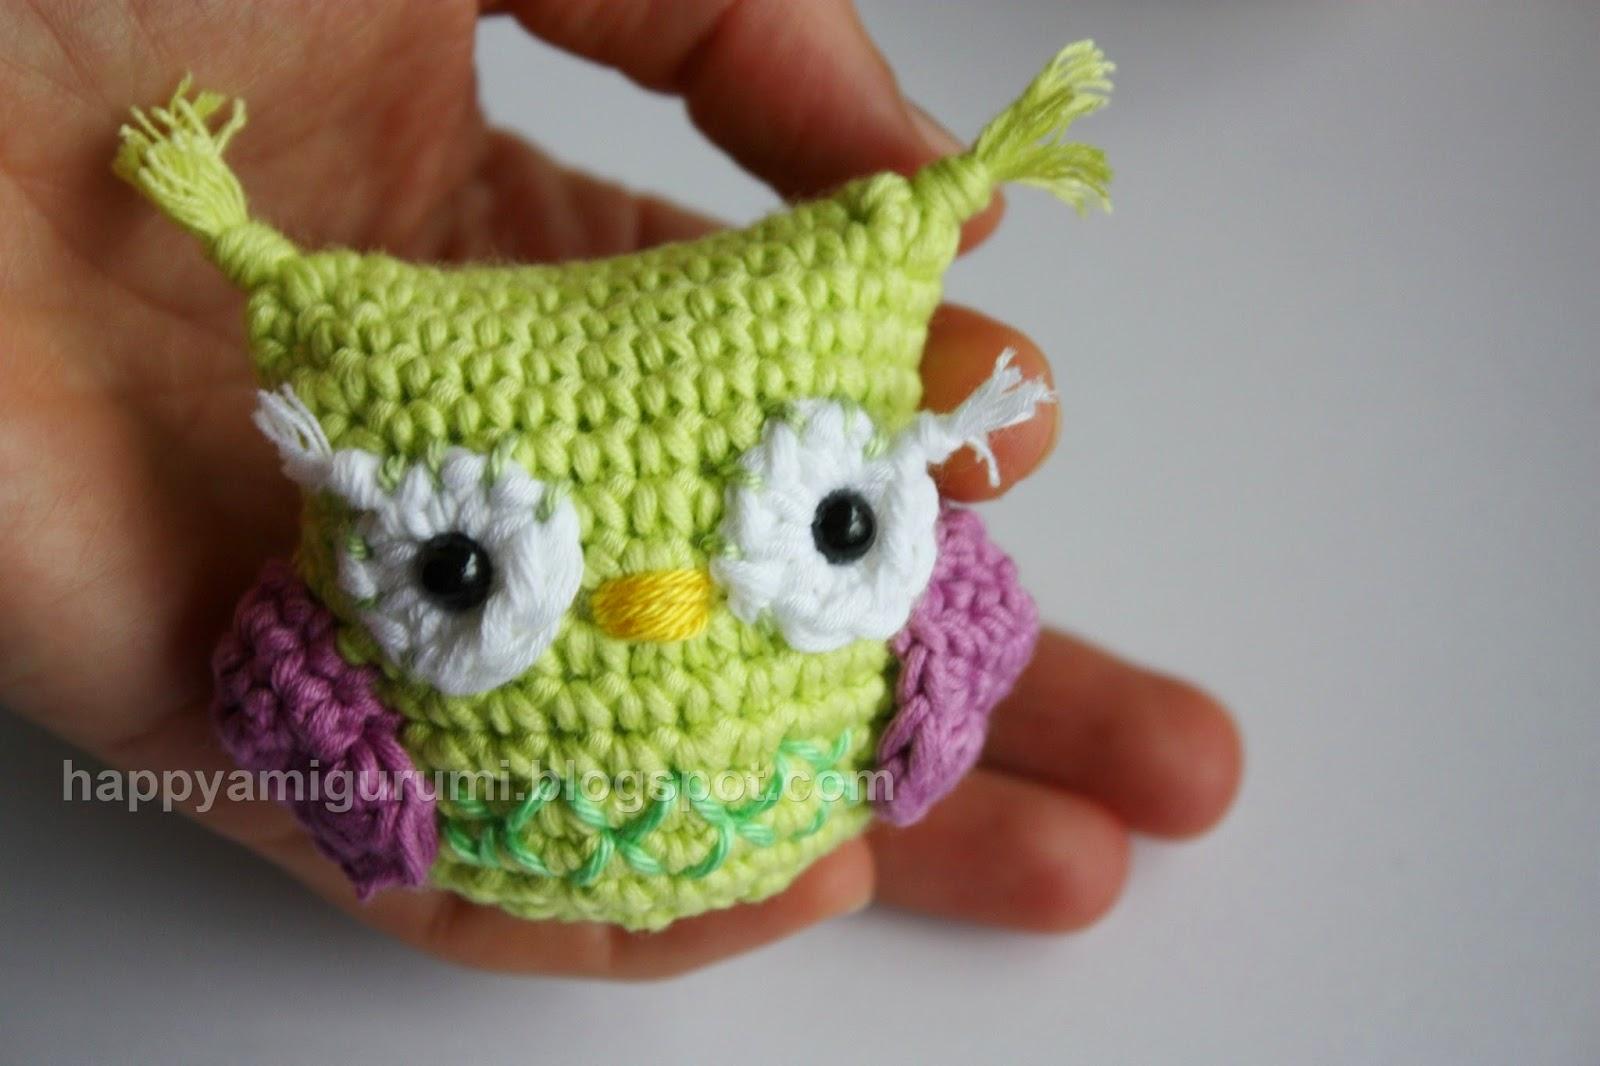 Little Owl Free Crochet Pattern : HAPPYAMIGURUMI: Free Amigurumi Pattern - OWL